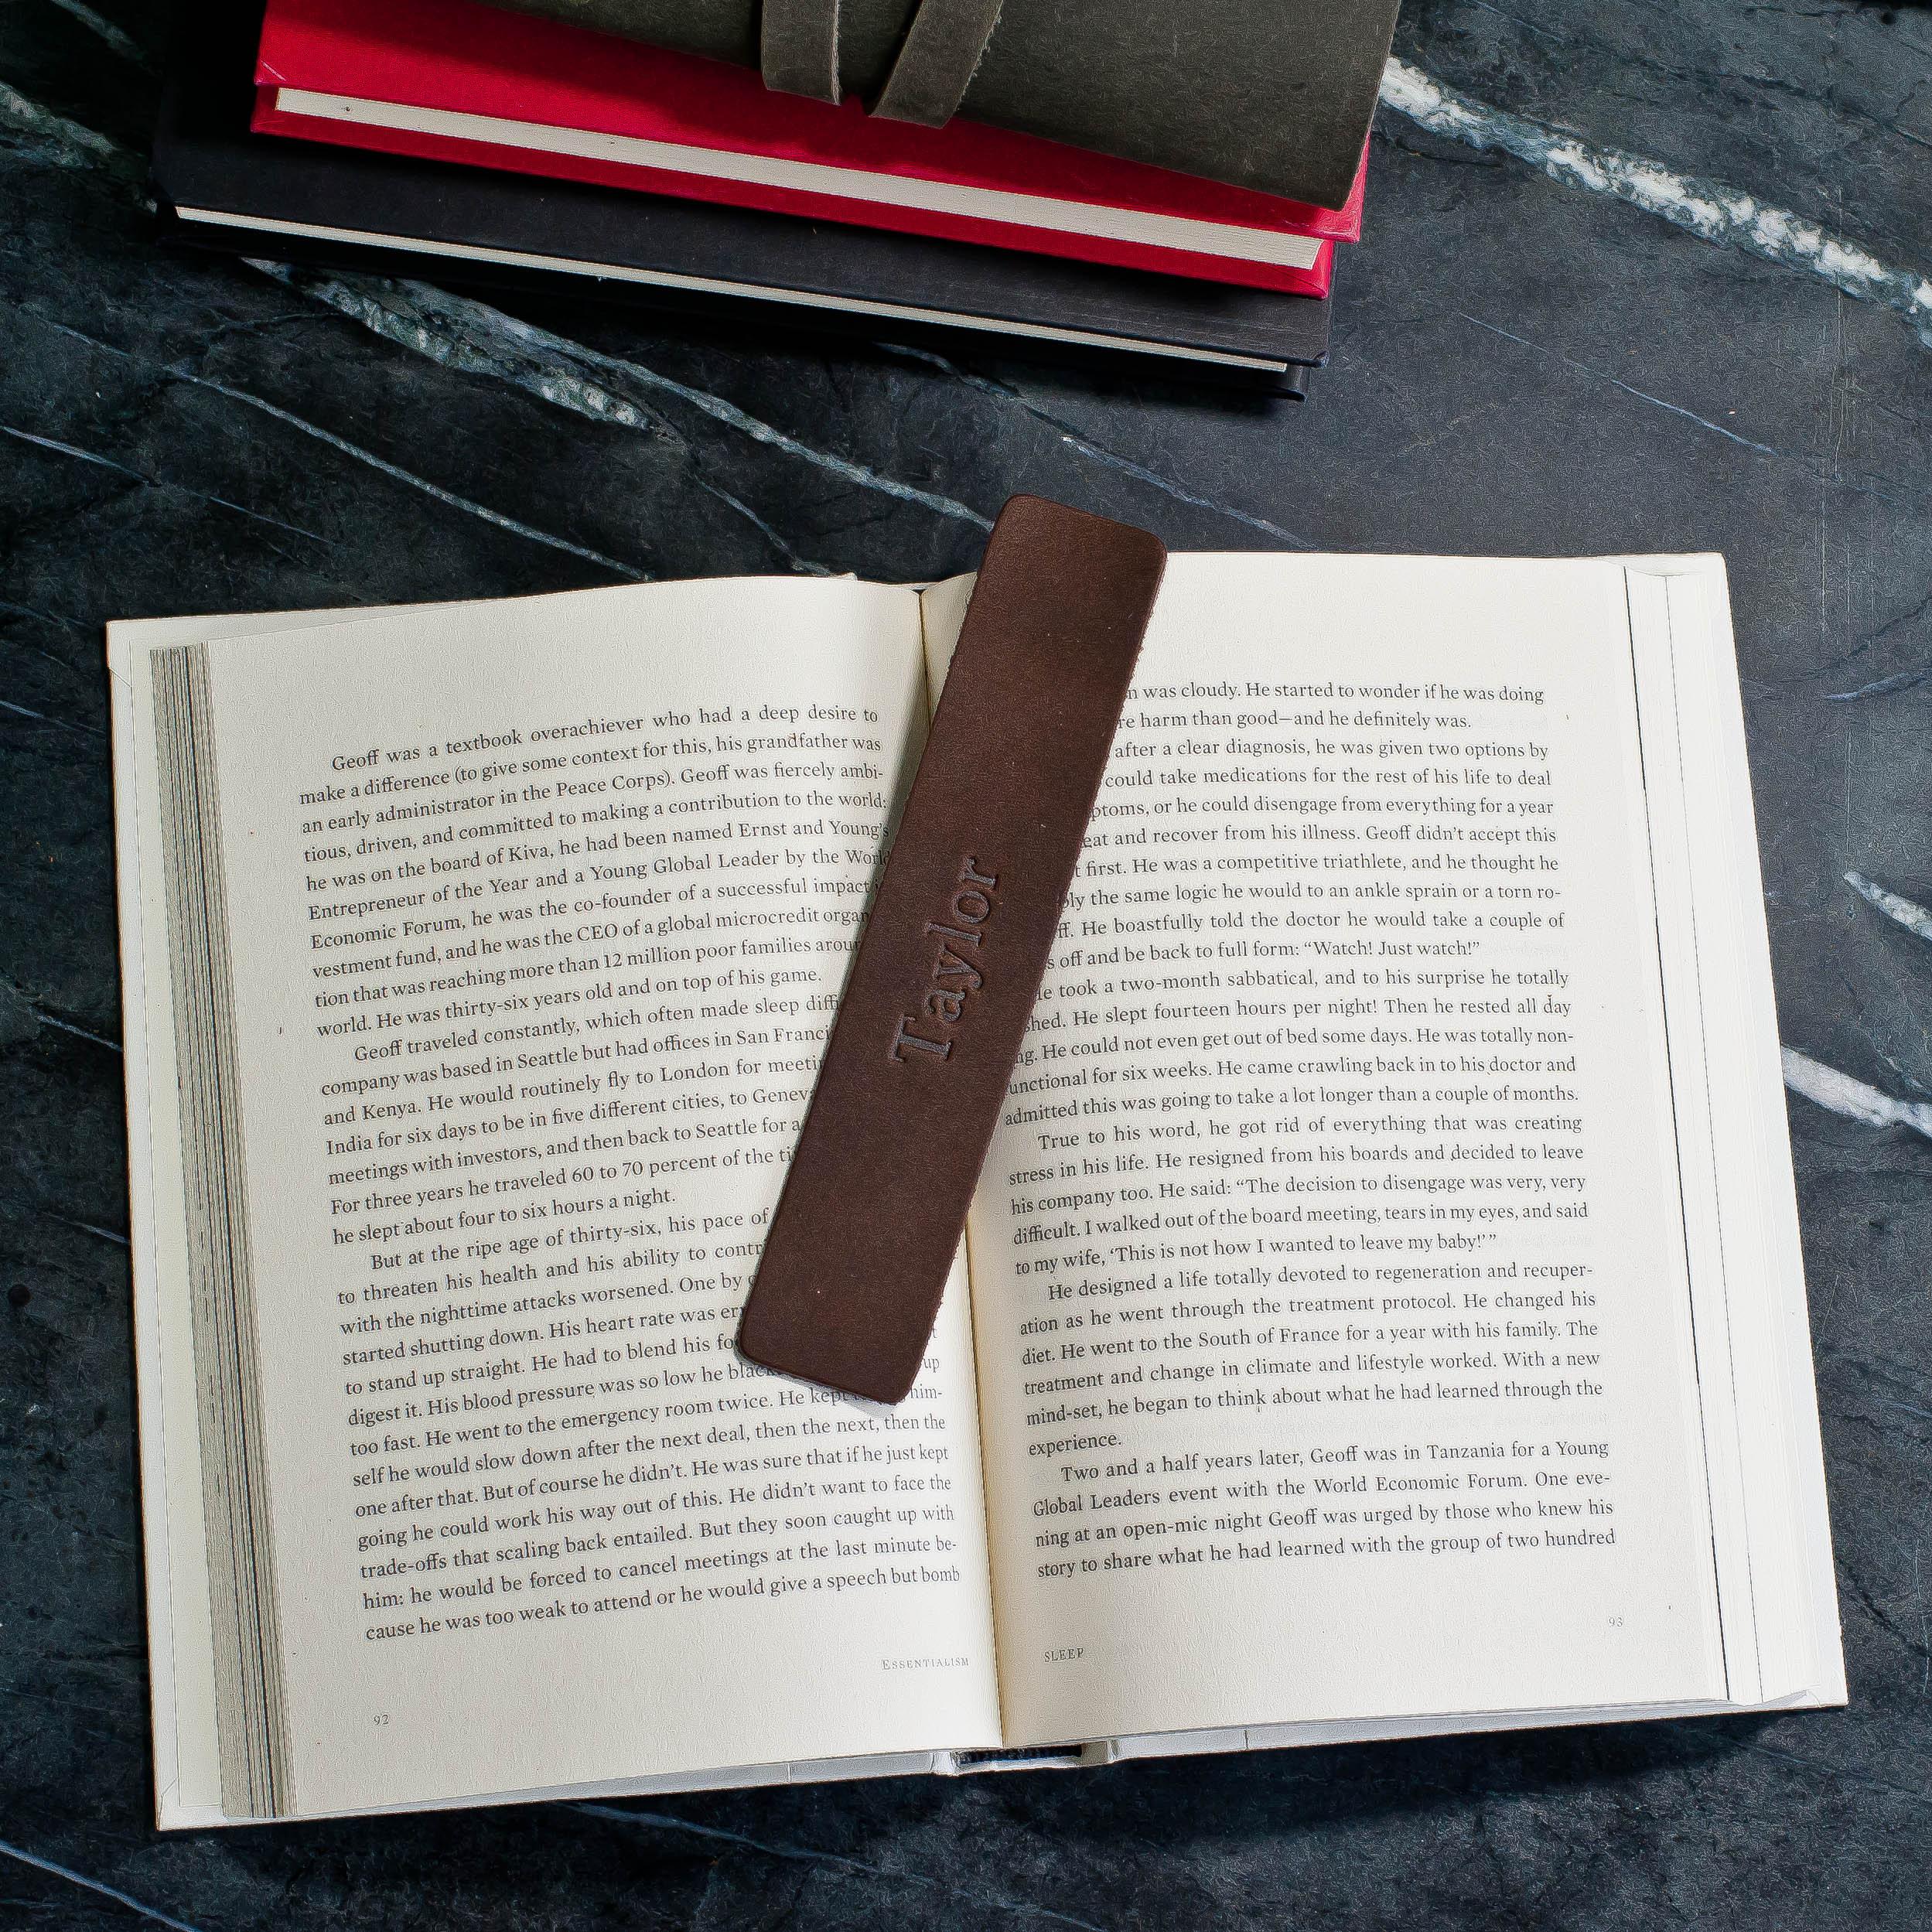 Personalized Premium Leather Bookmark image 1